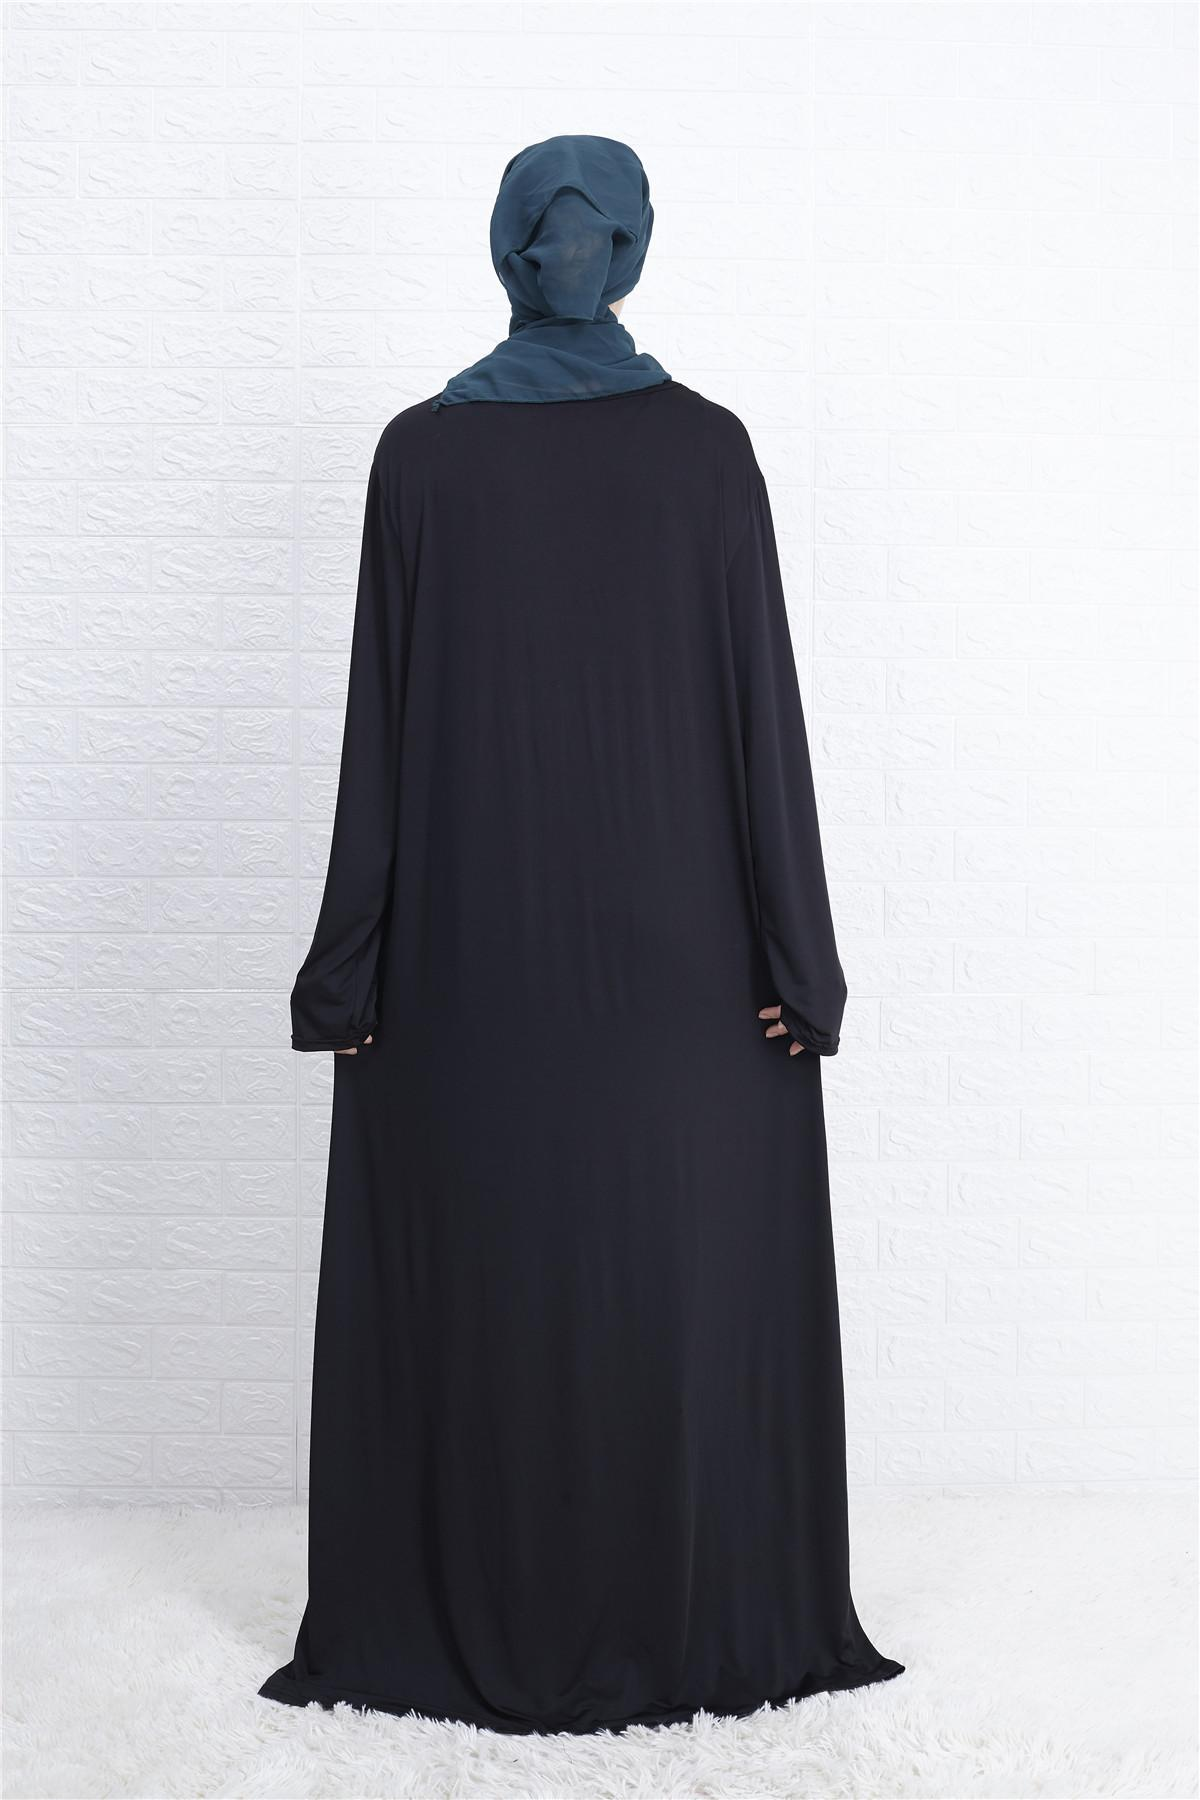 Ramadan Muslim Women Arab Dress Abaya Long Maxi Robe Islamic Kaftan Jilbab Party Cocktail Prayer Clothes Loose Worship Service